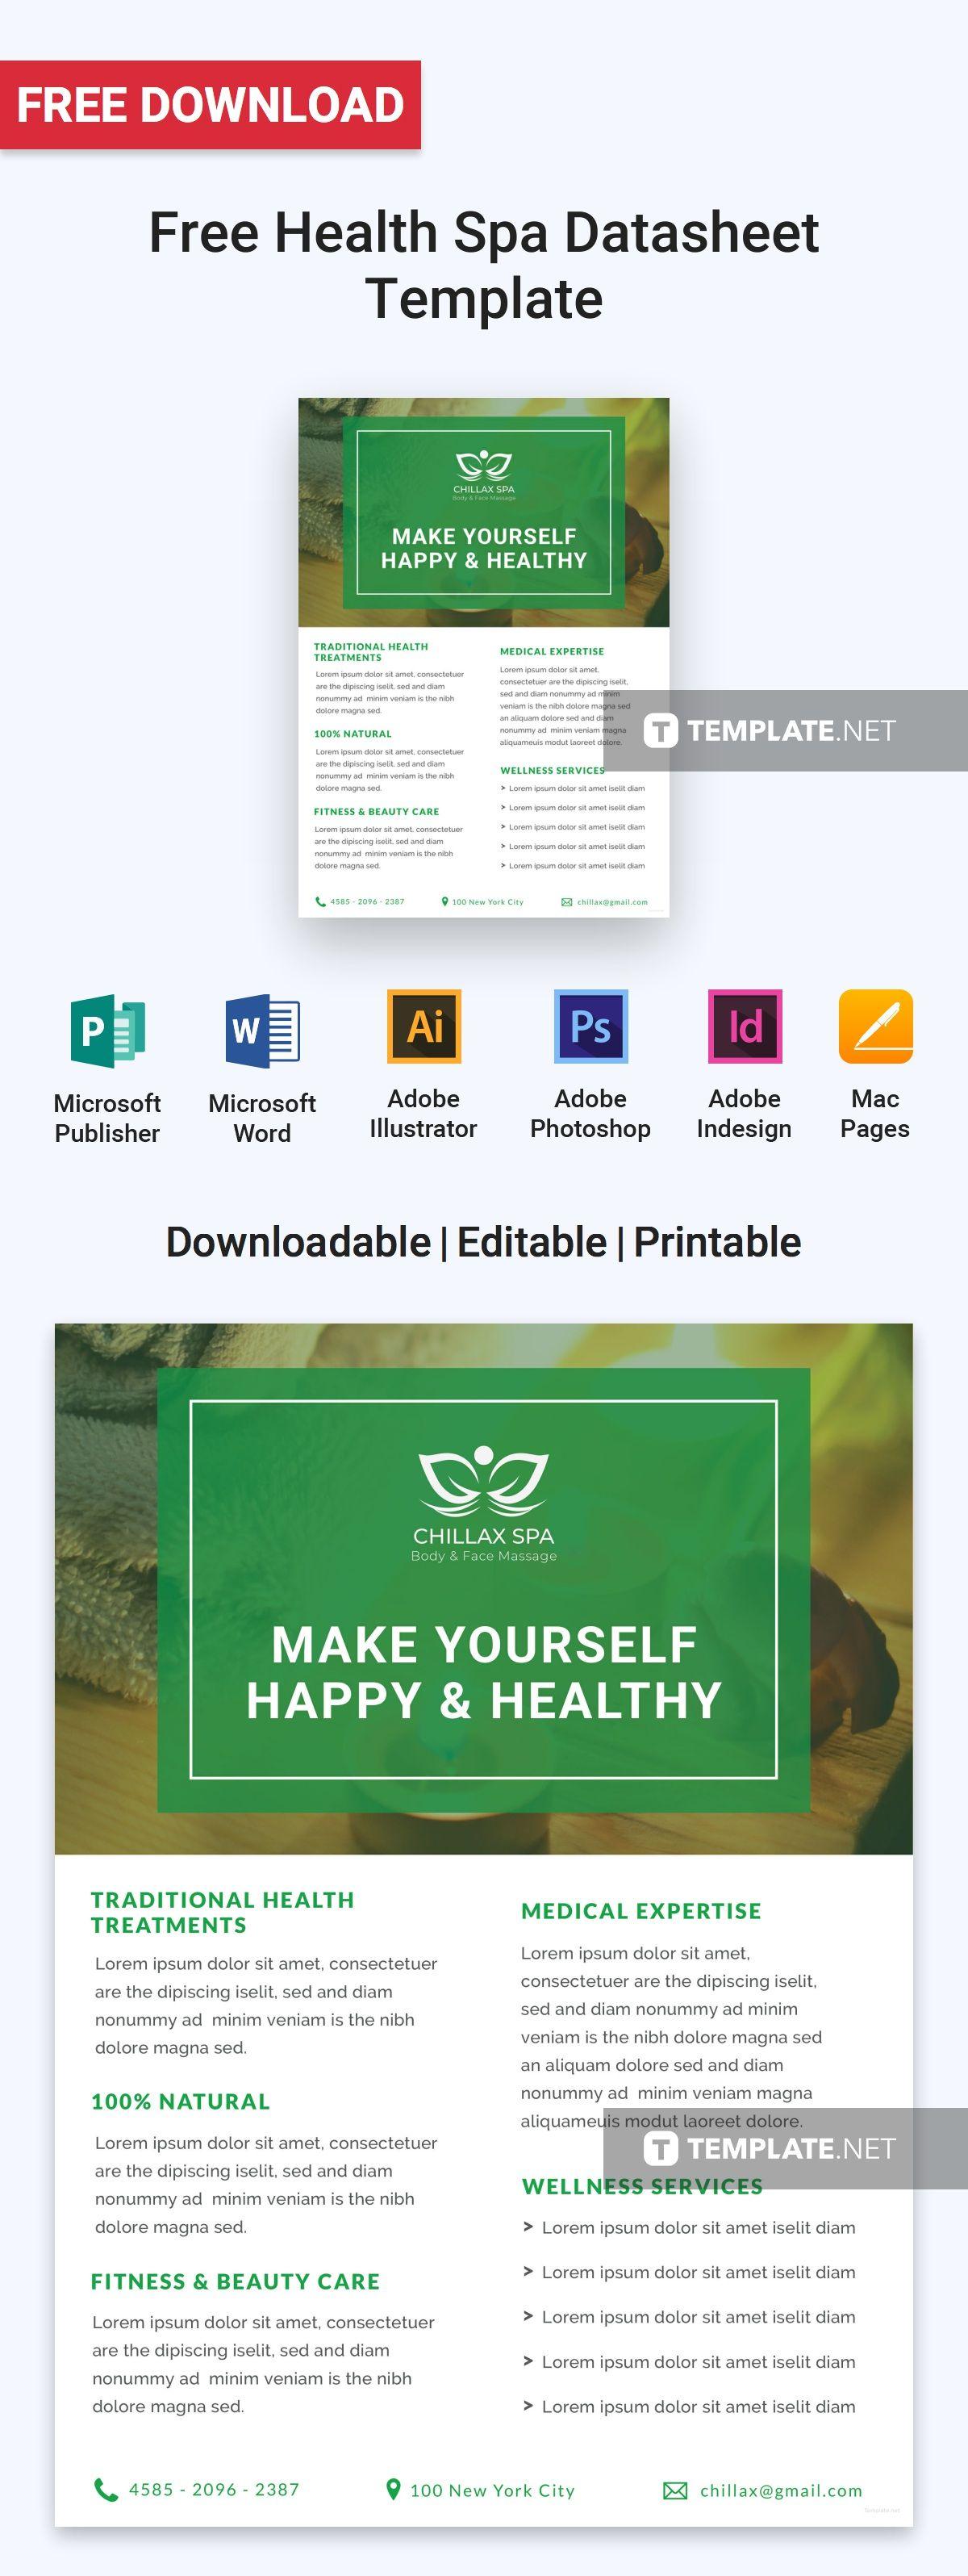 Free Health Spa Datasheet | Pinterest